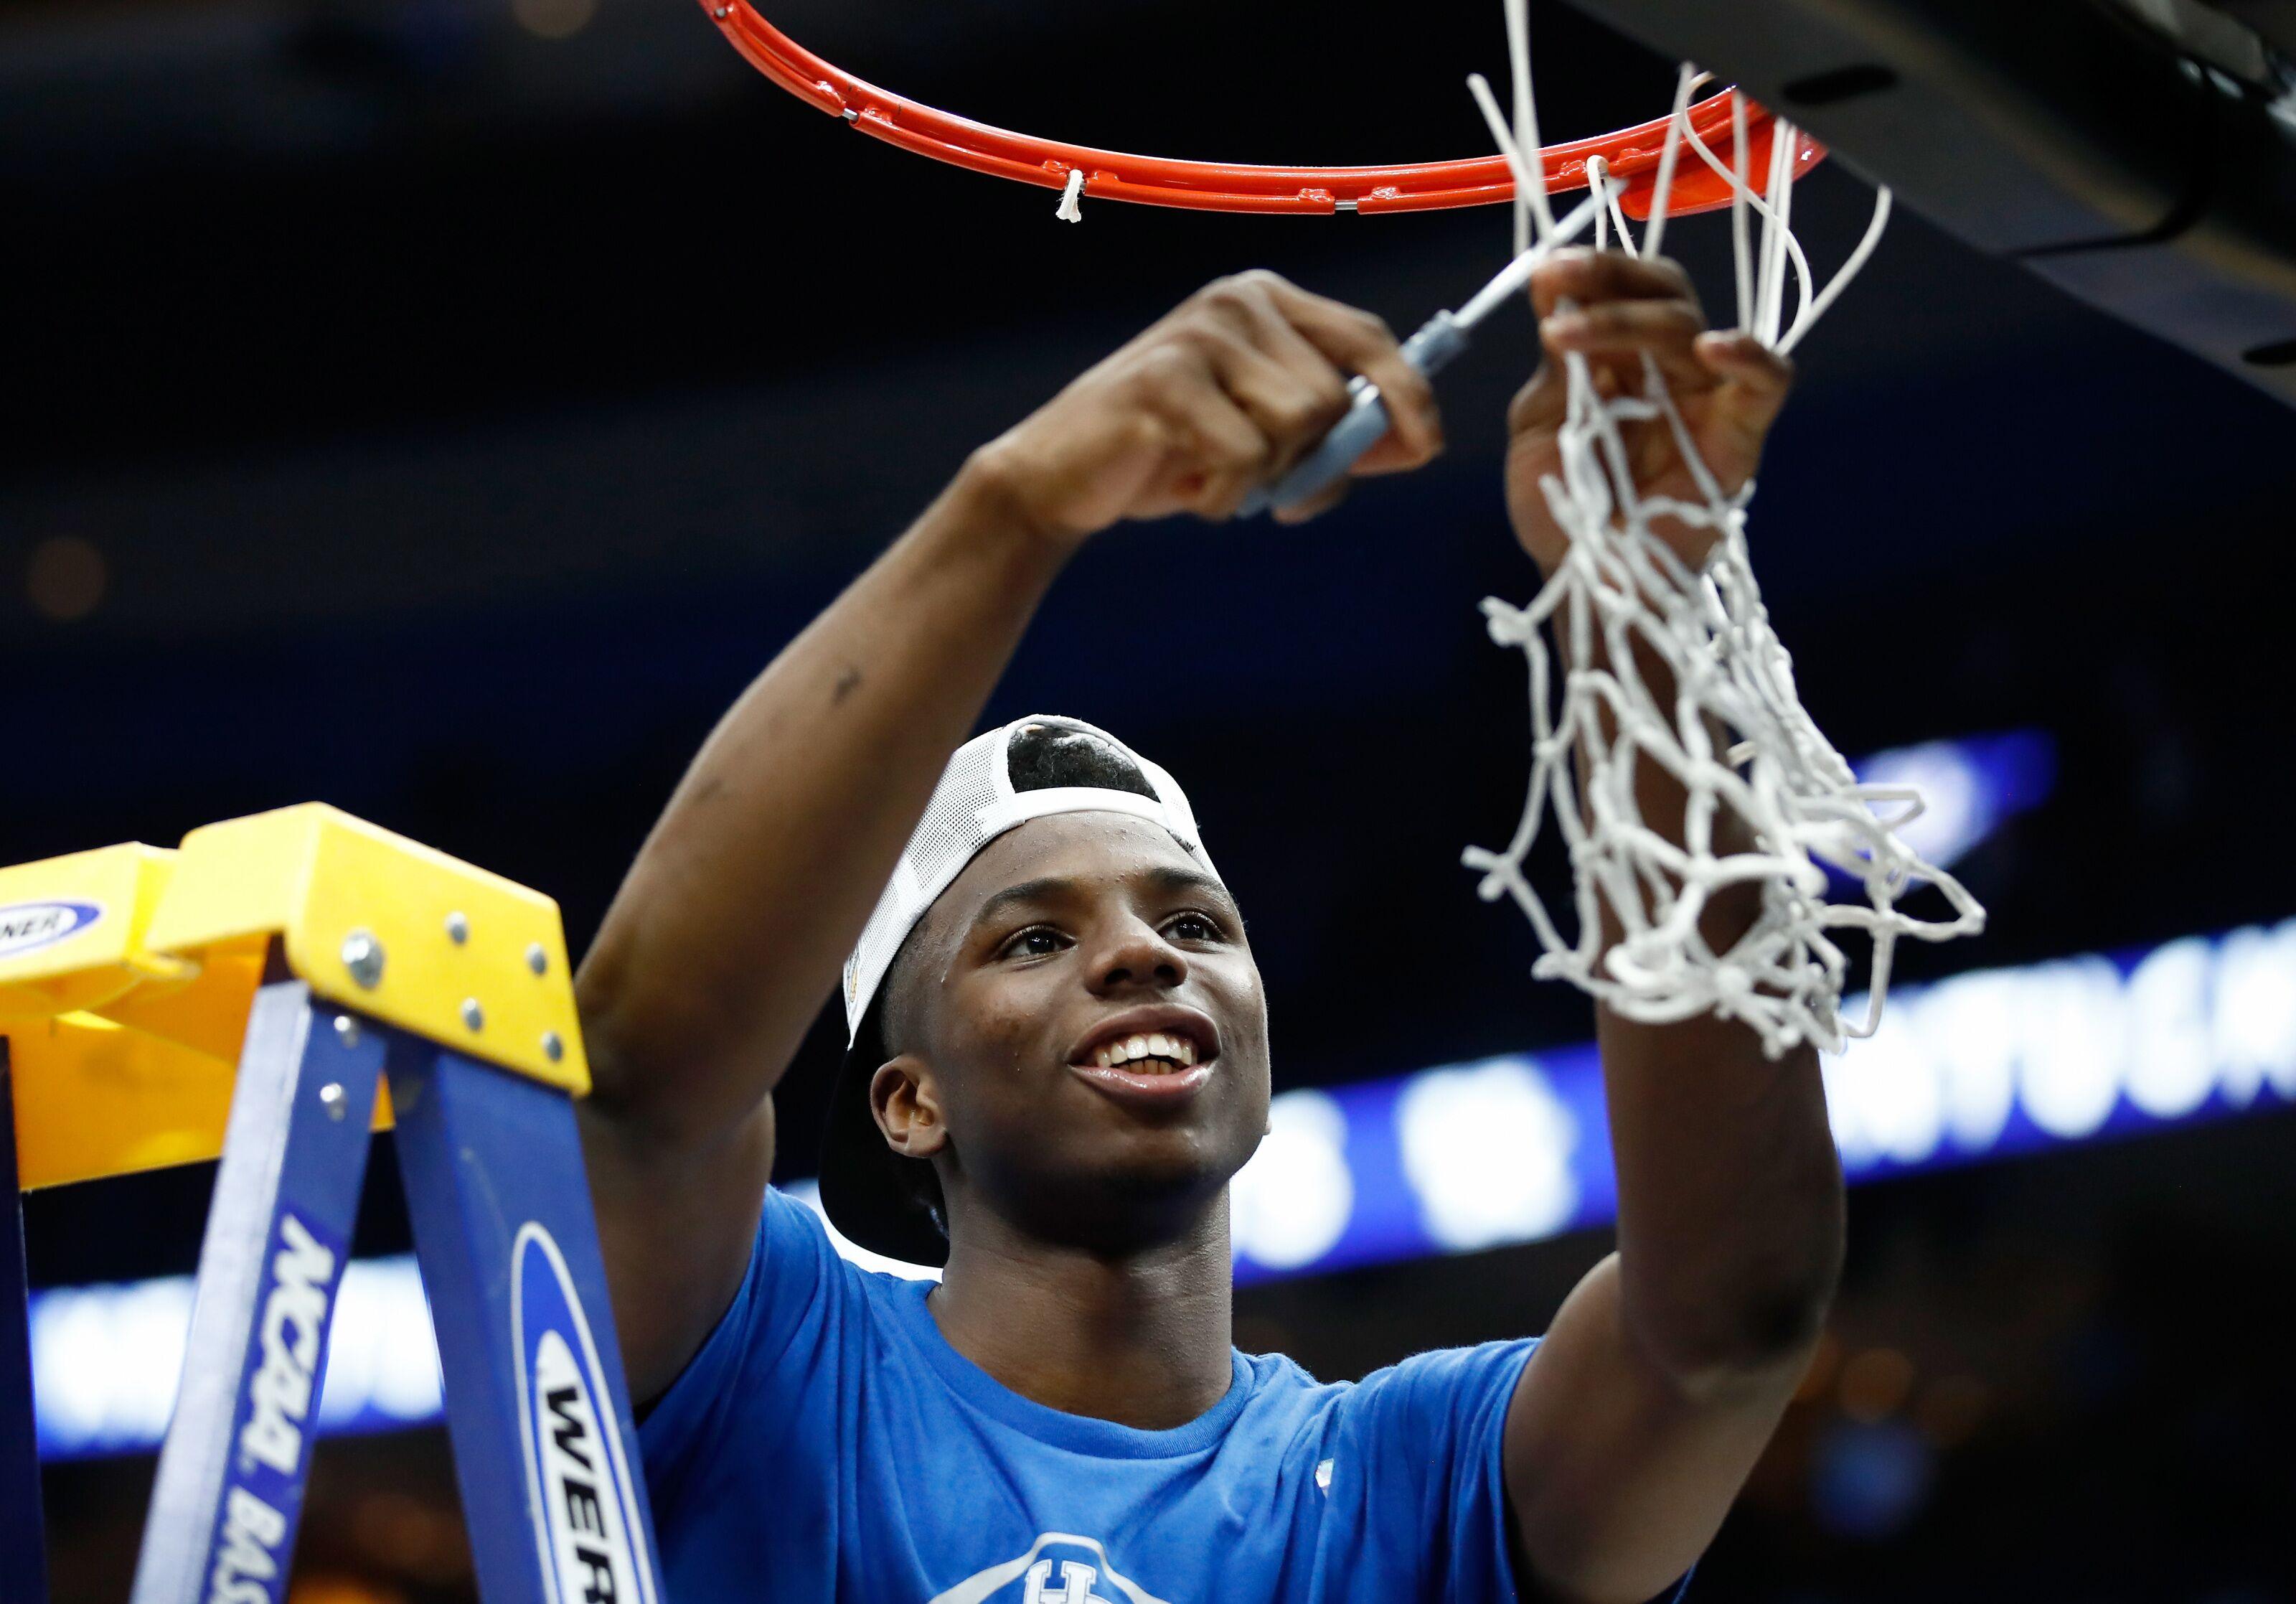 SEC Basketball: Preseason Rankings For 2018-19